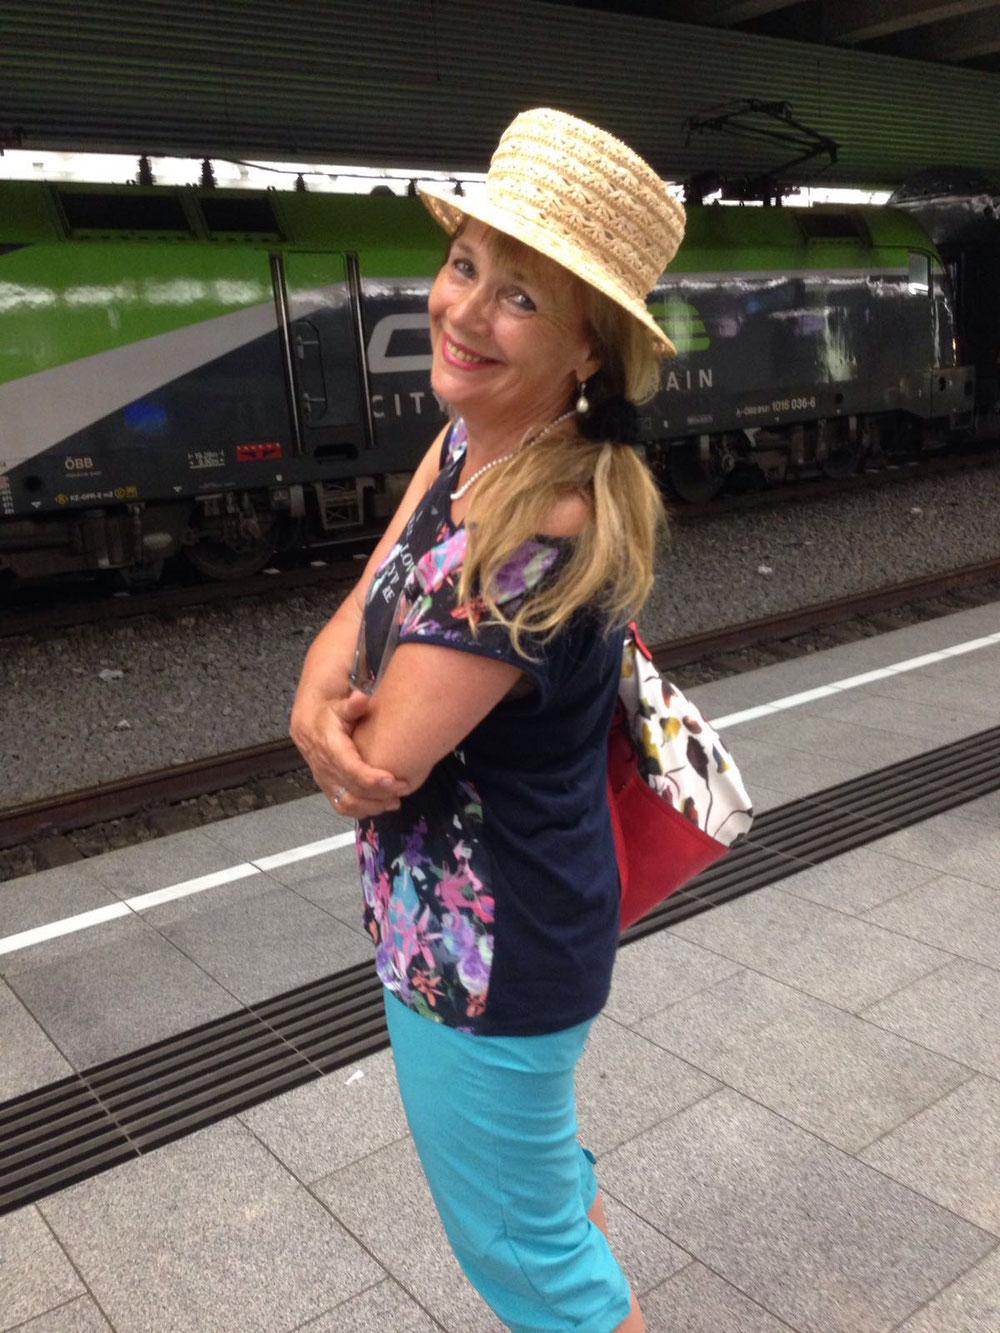 Flughafen Wien Juli 2016